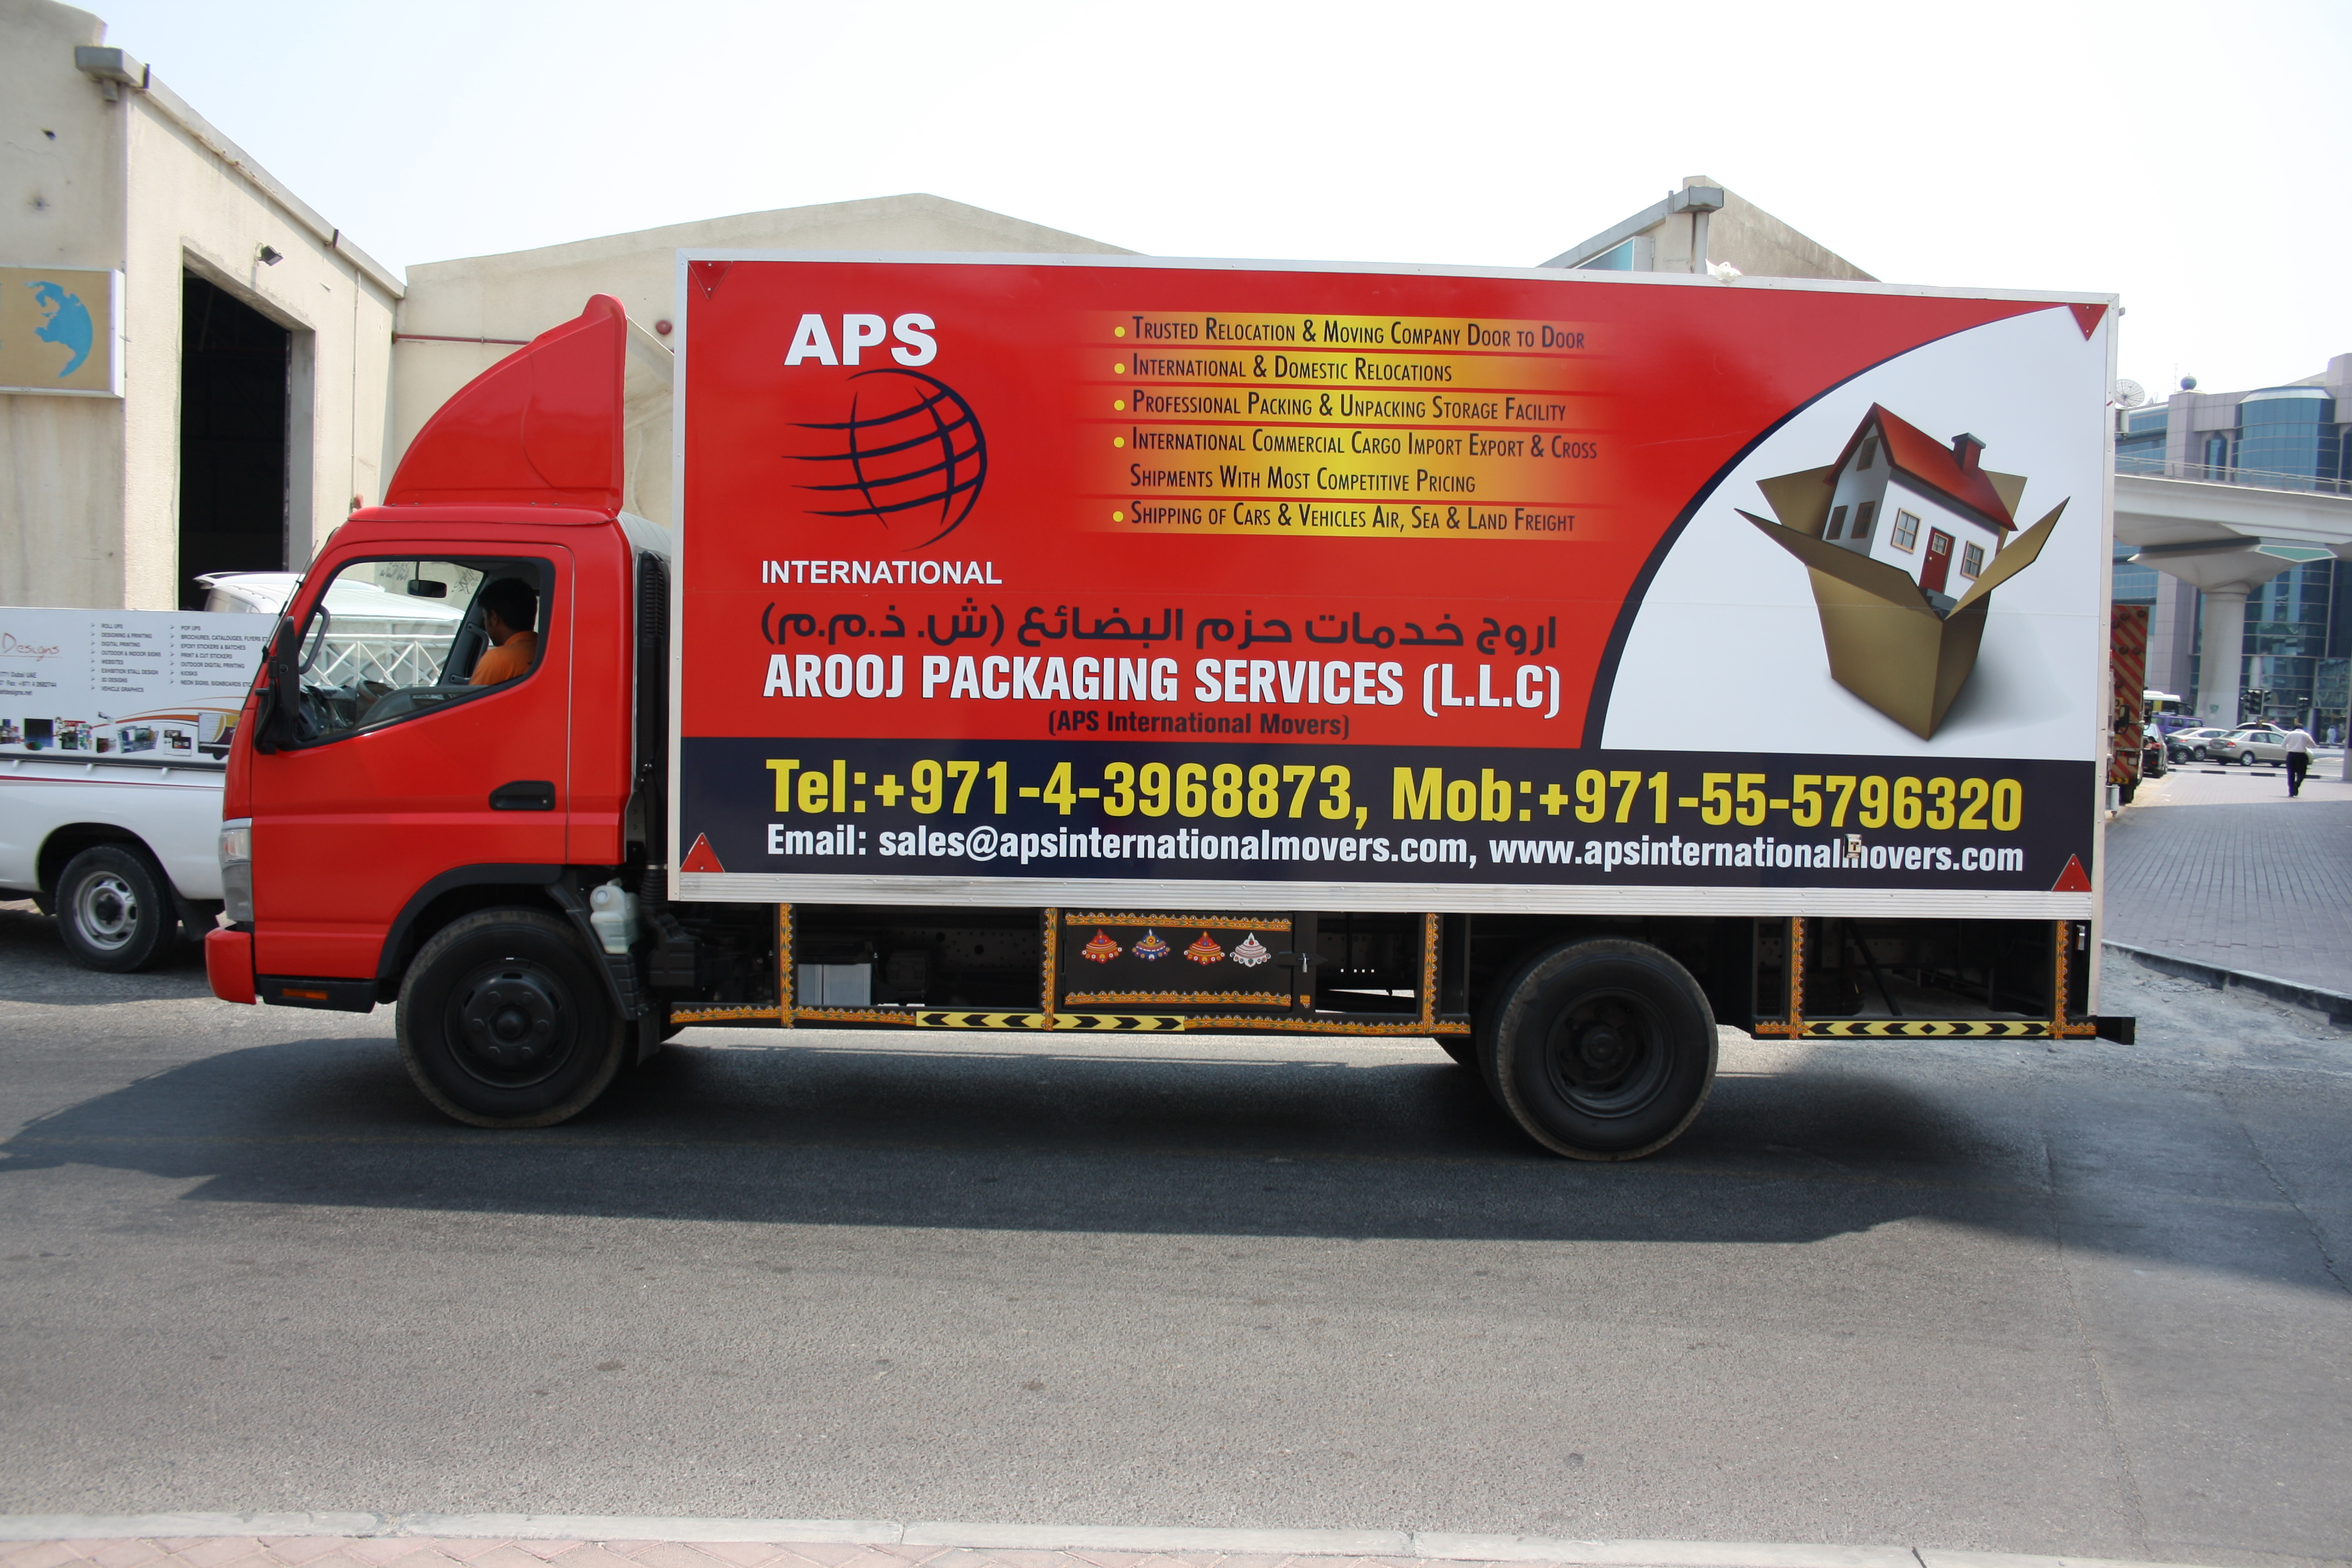 Aps International Movers Llc In Dubai